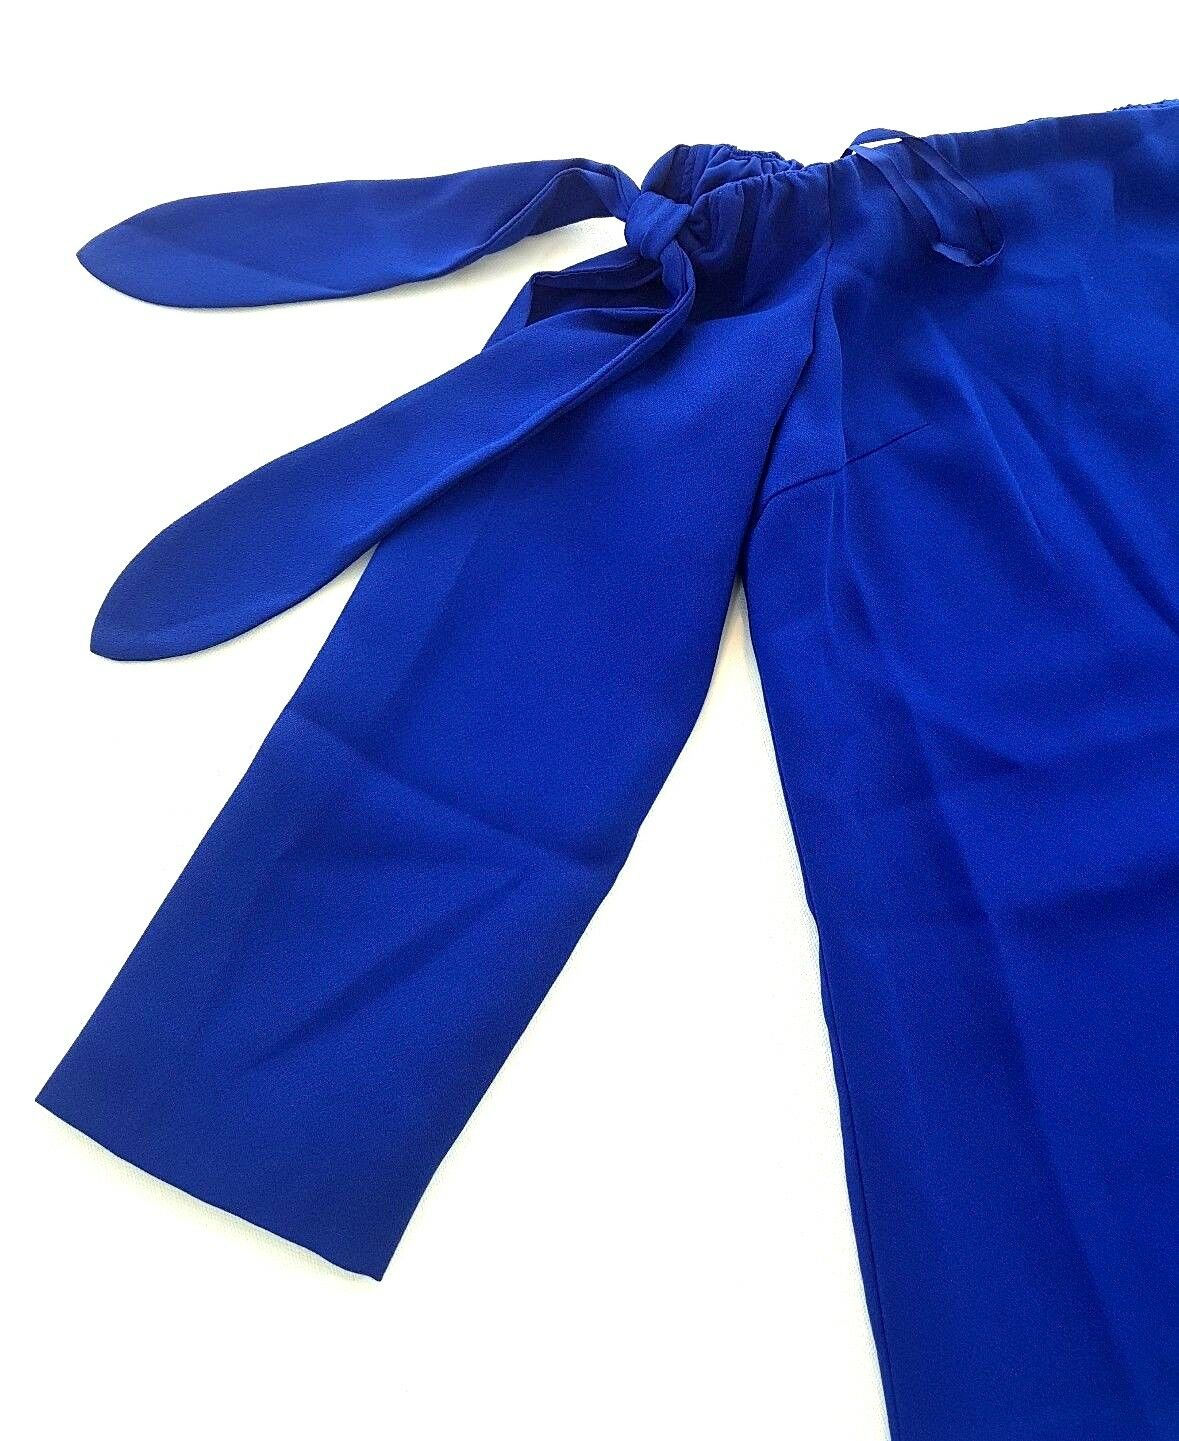 Club Club Club Monaco Off The Shoulder blueeberry Solanga Mini Dress Size 00 Womens bluee f671c4